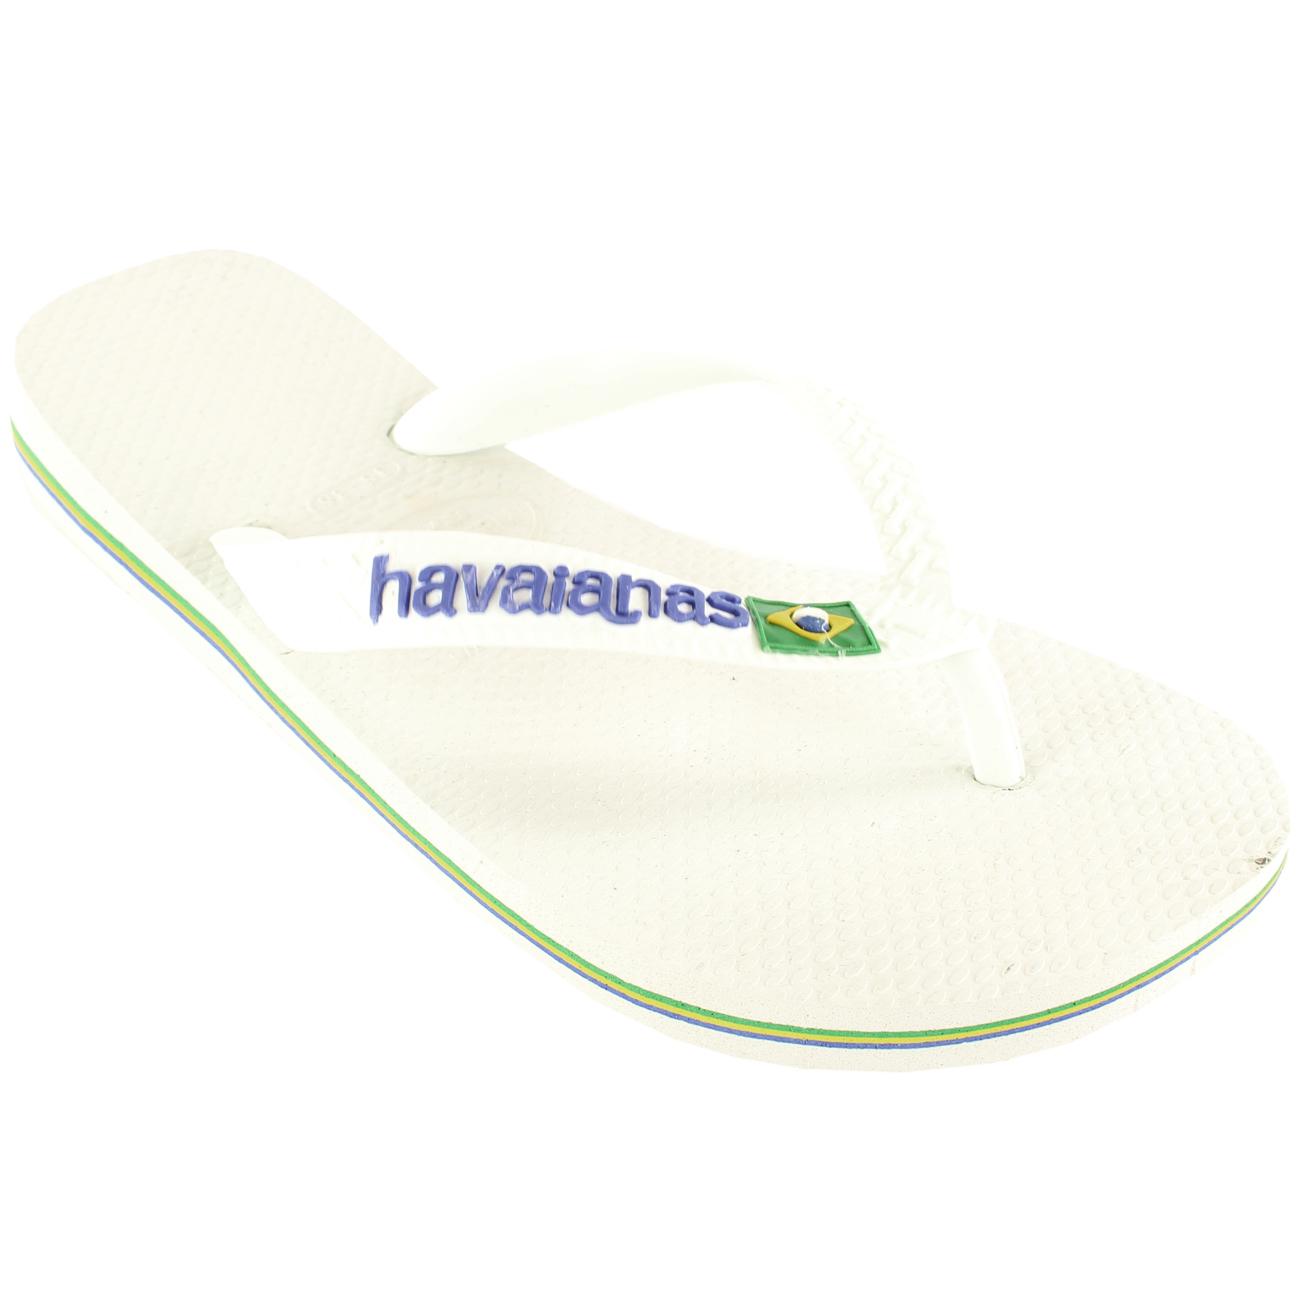 992b0115a6c33c Details about Ladies Havaianas Brasil Logo Slip On Flip Flops Summer Beach  Sandals All Sizes